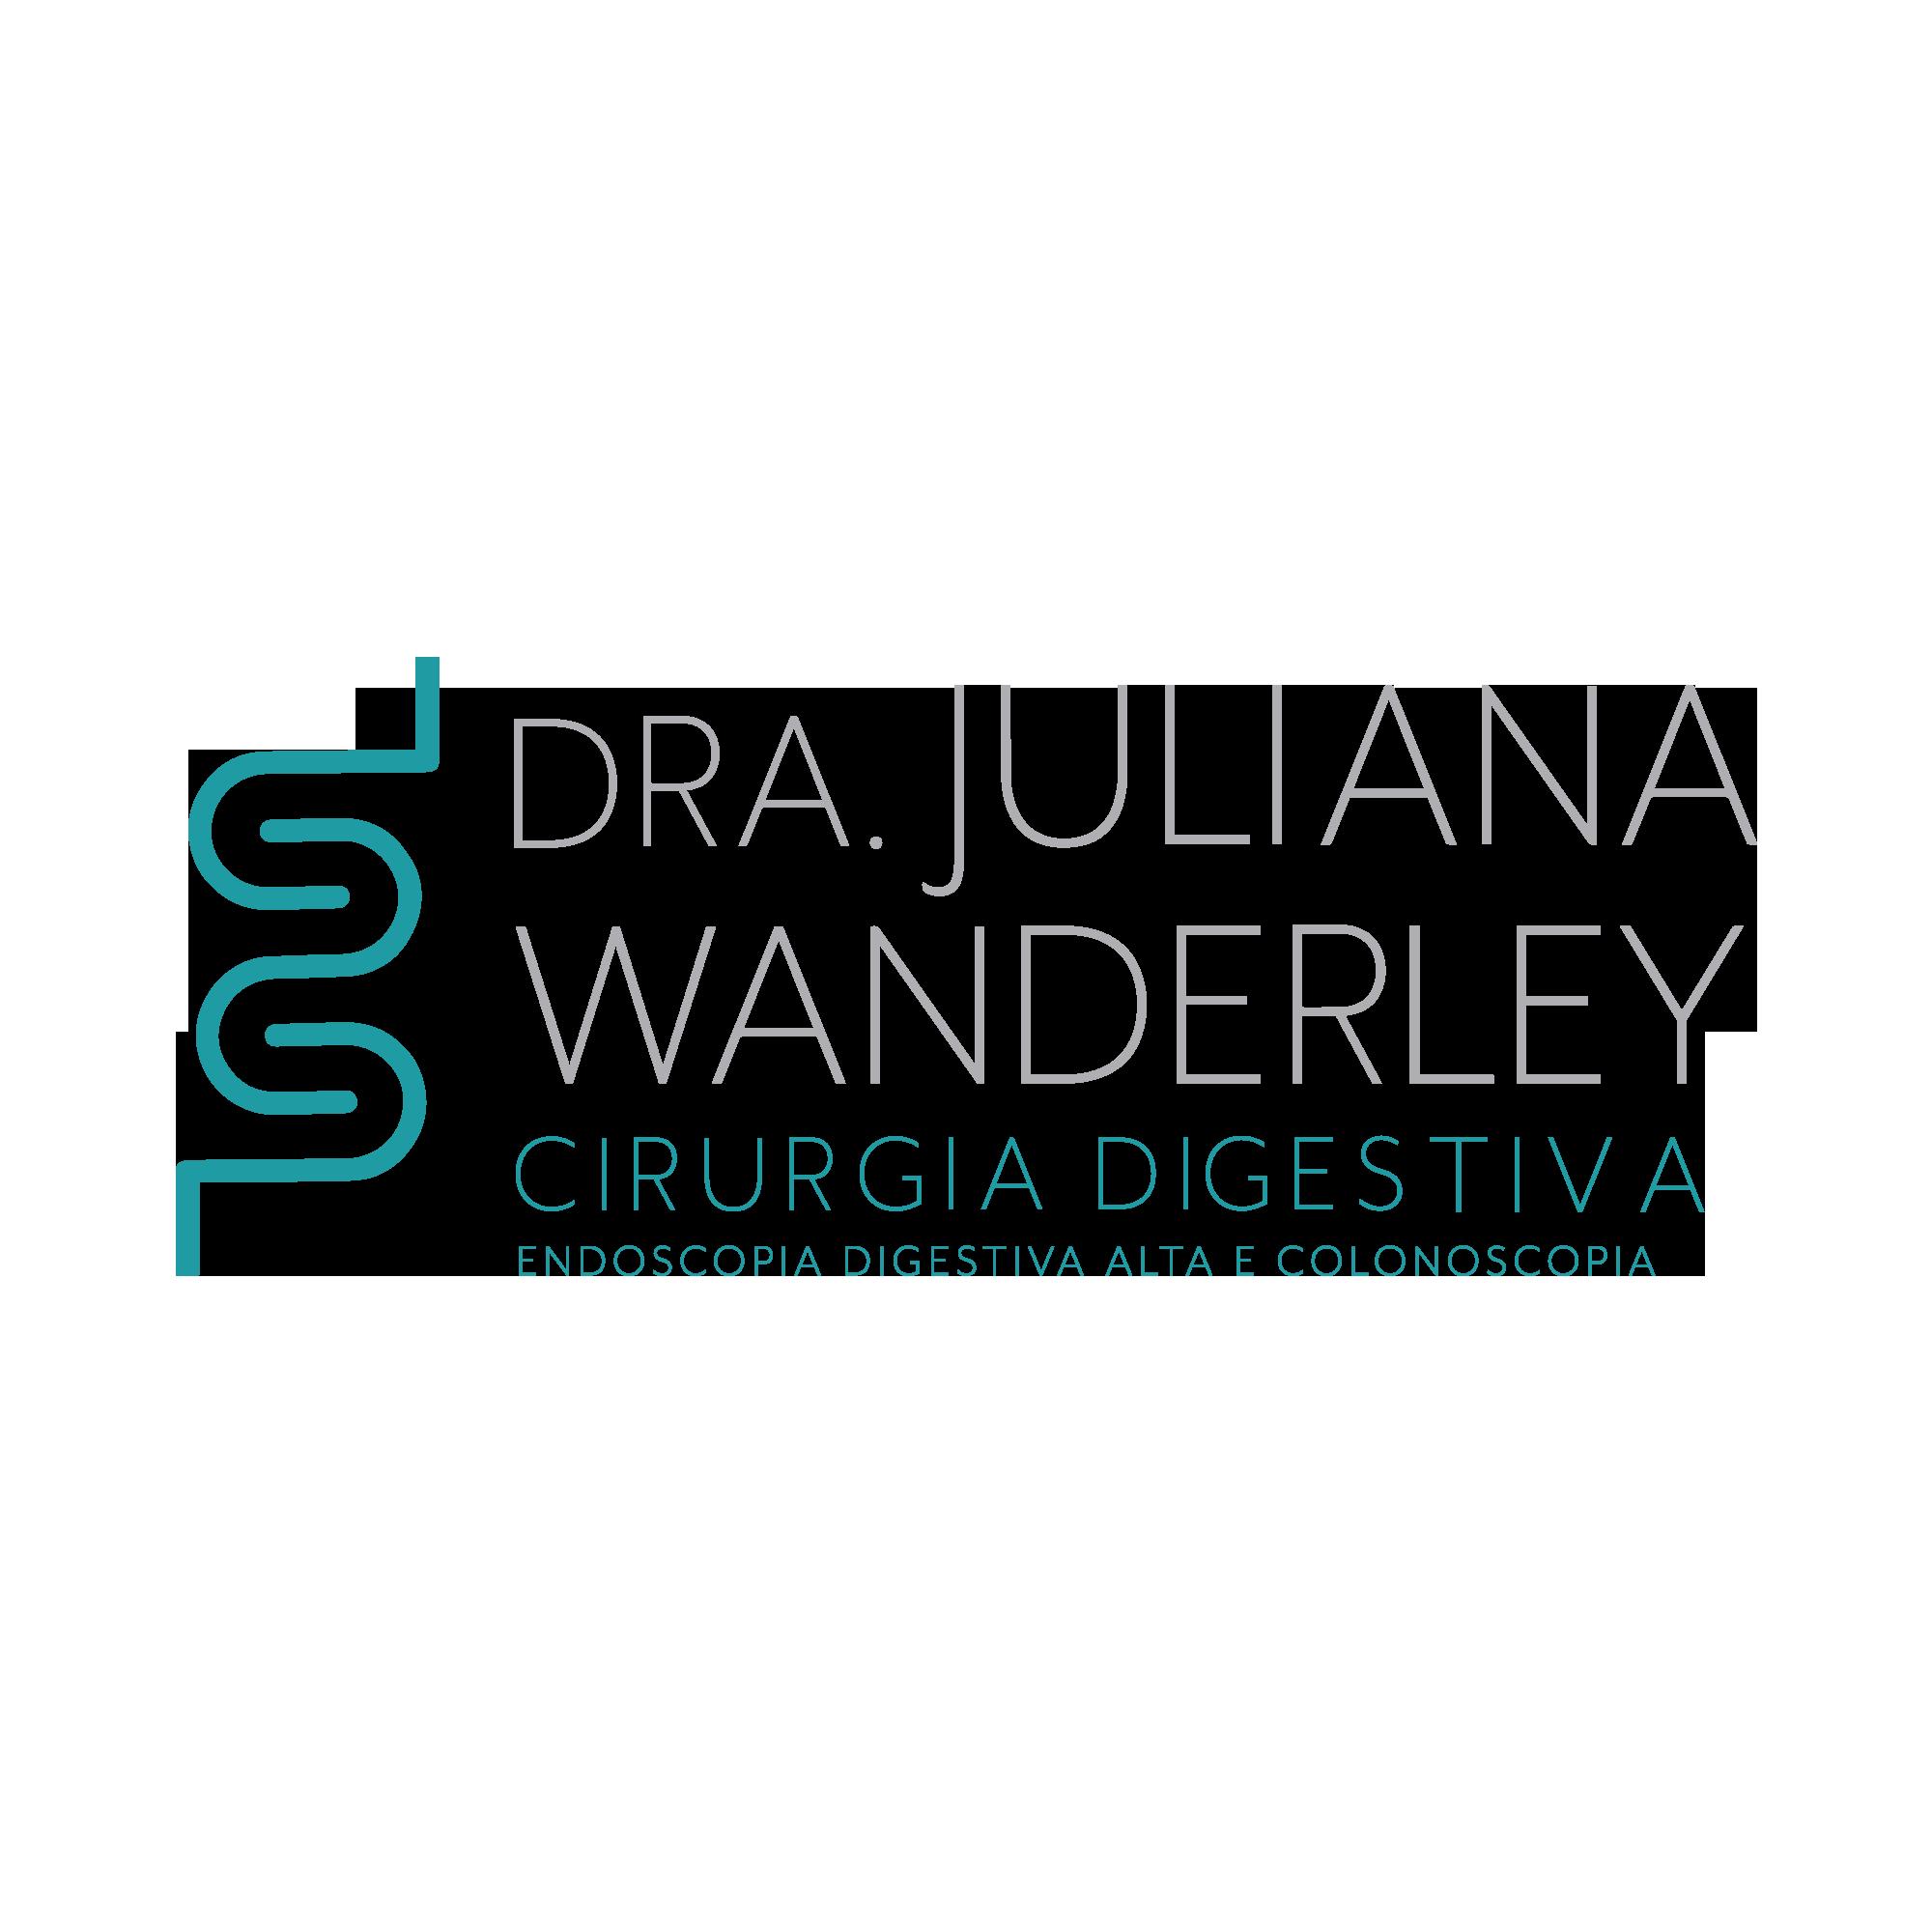 LOGO DRA. JULIANA WANDERLEY